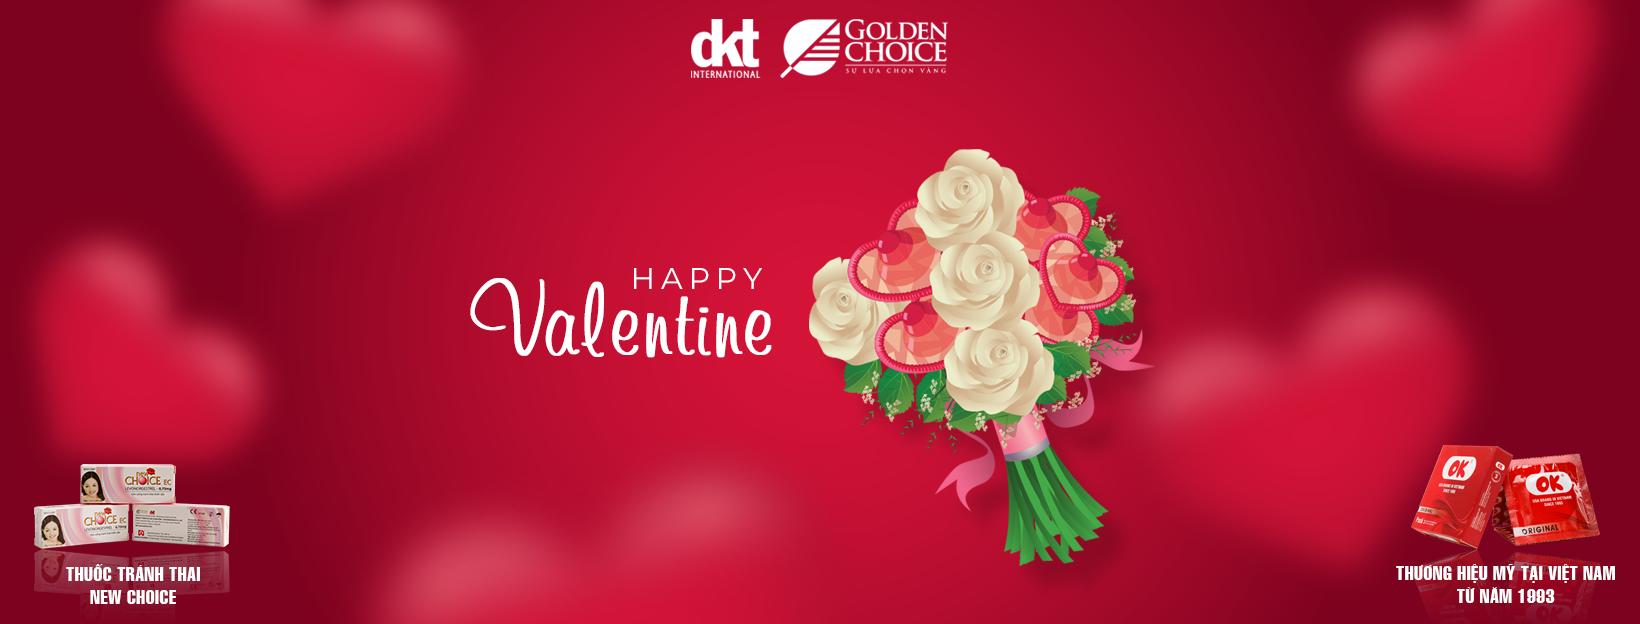 DKT - GoldenChoice Valentine banner 2020